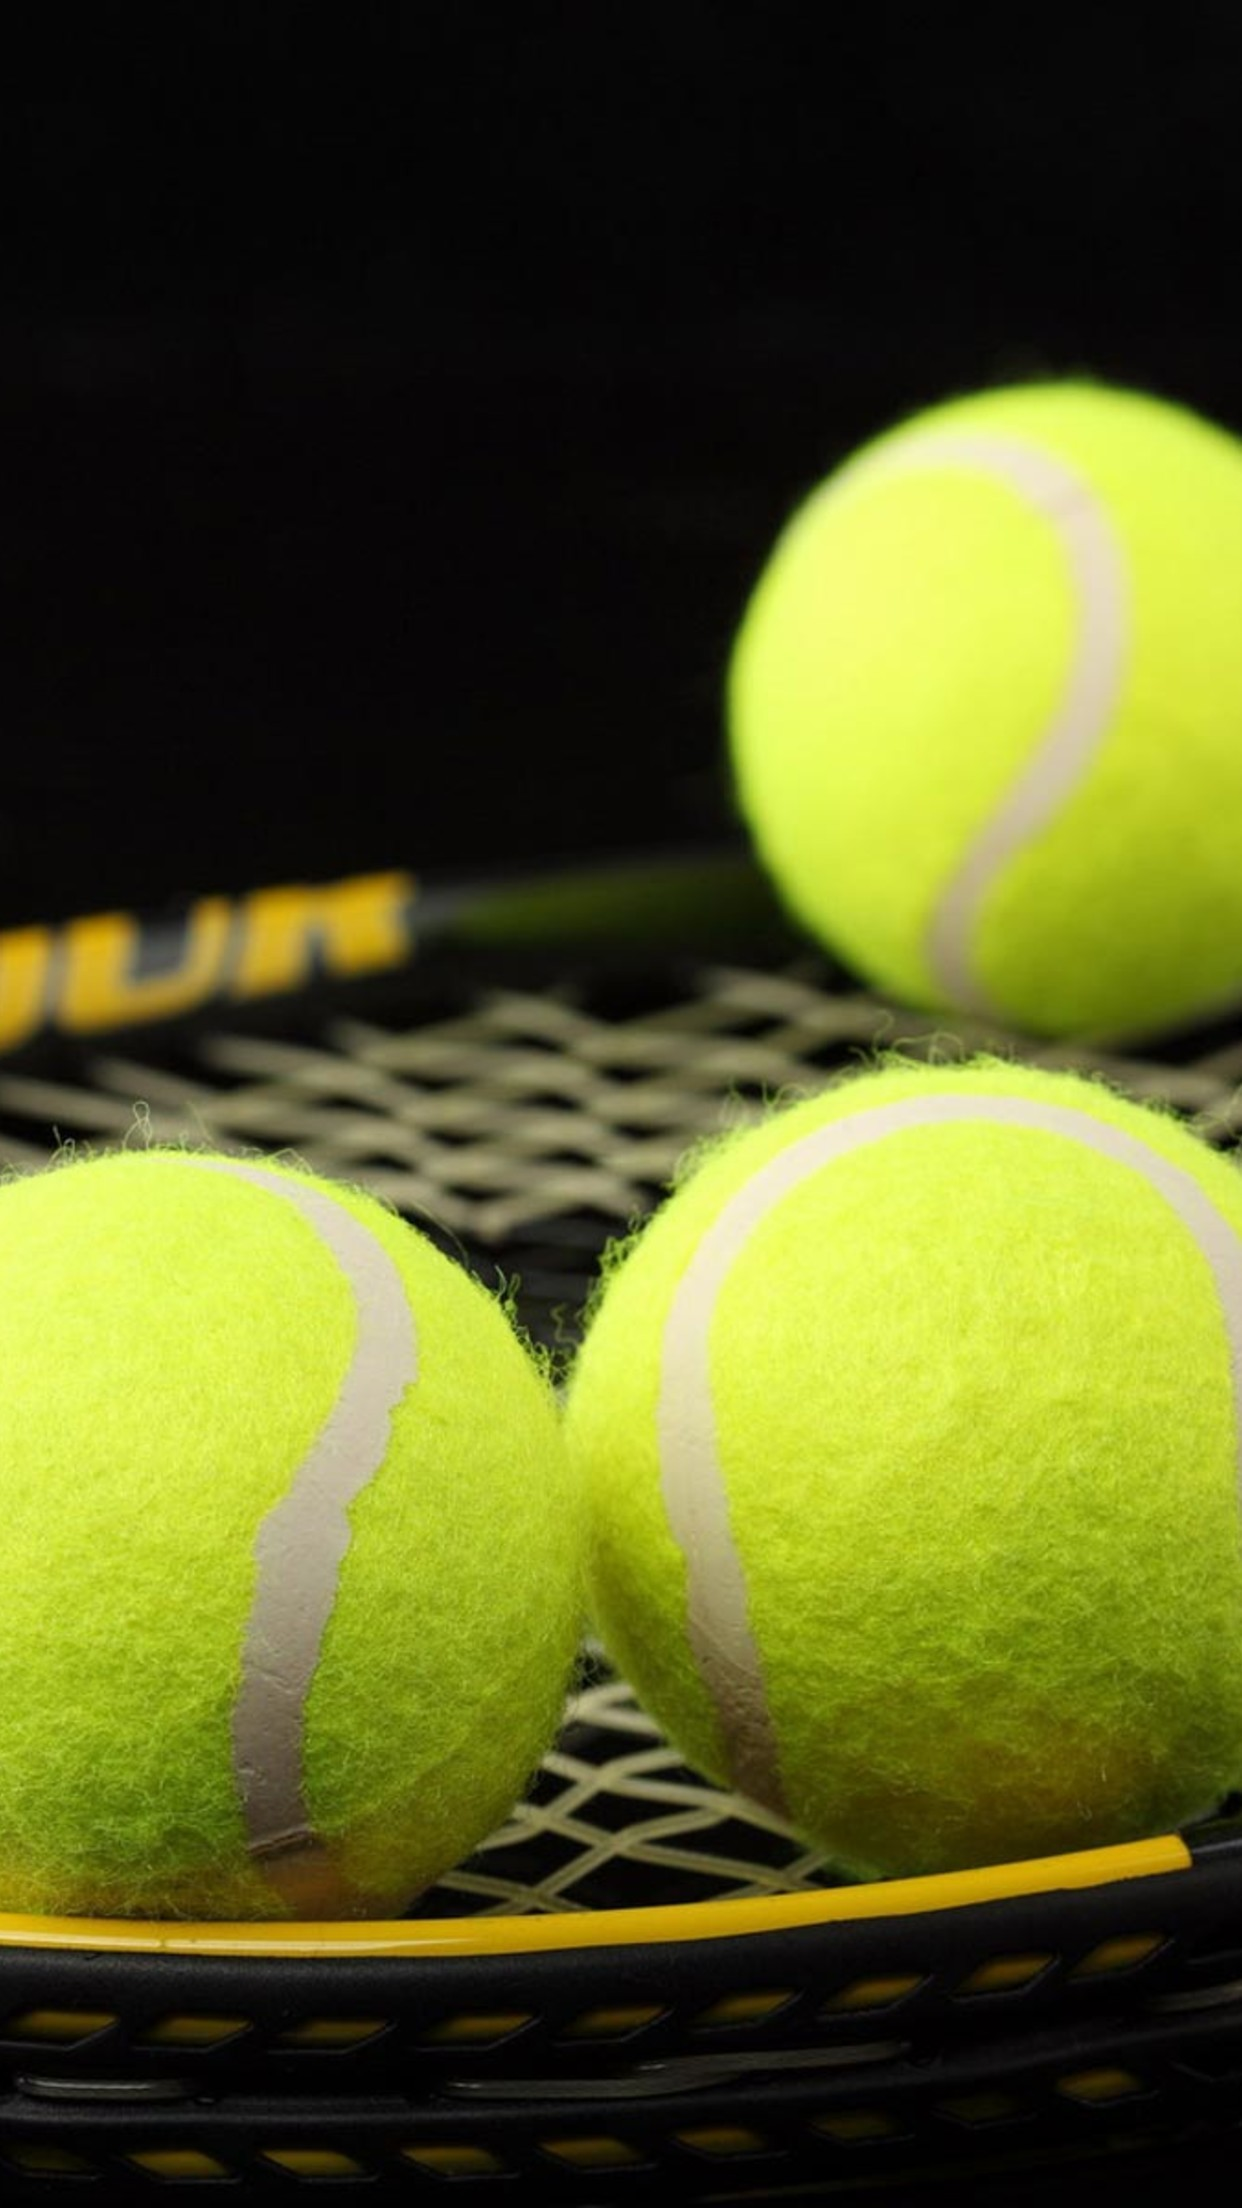 sport-tennis-3Wallpapers-iPhone-Parallax